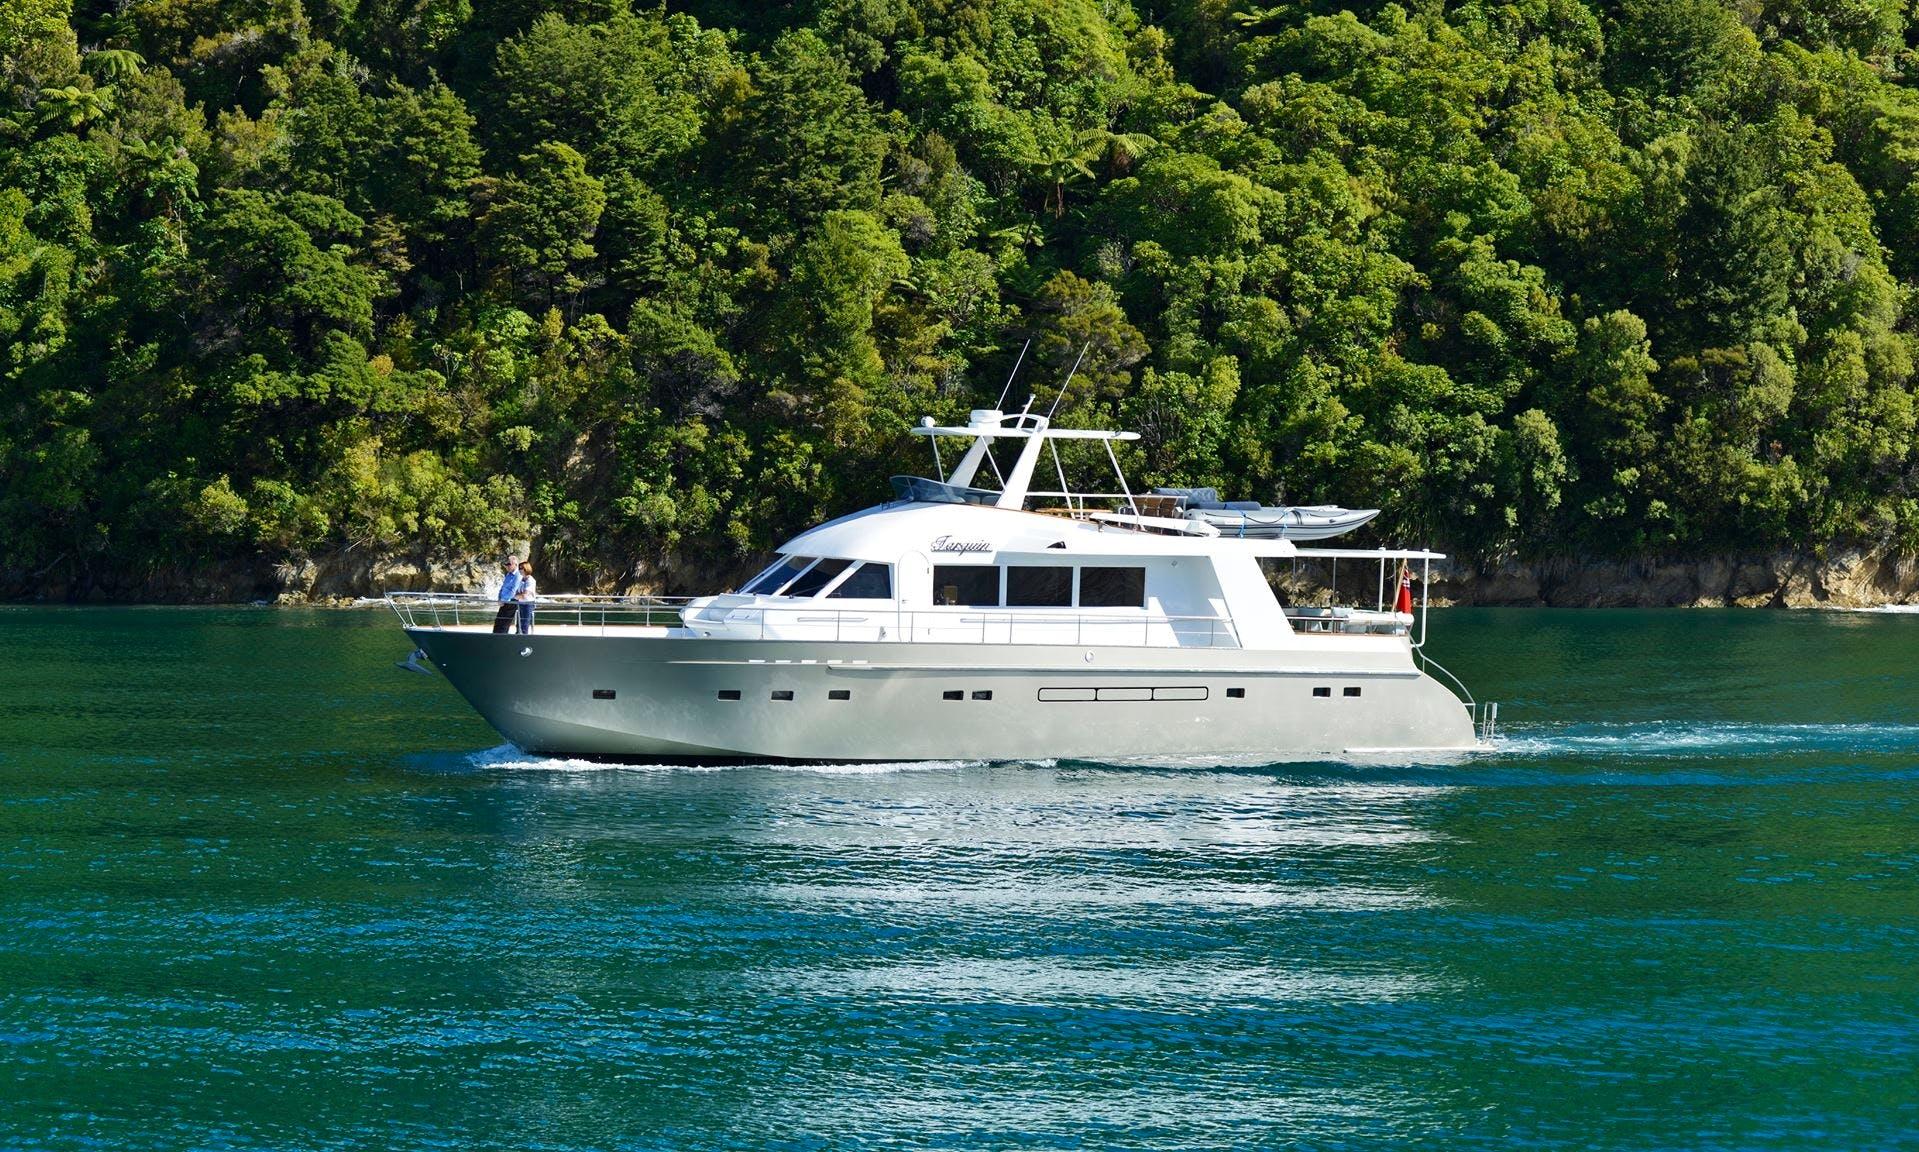 Luxury Yacht Cruises in Grovetown